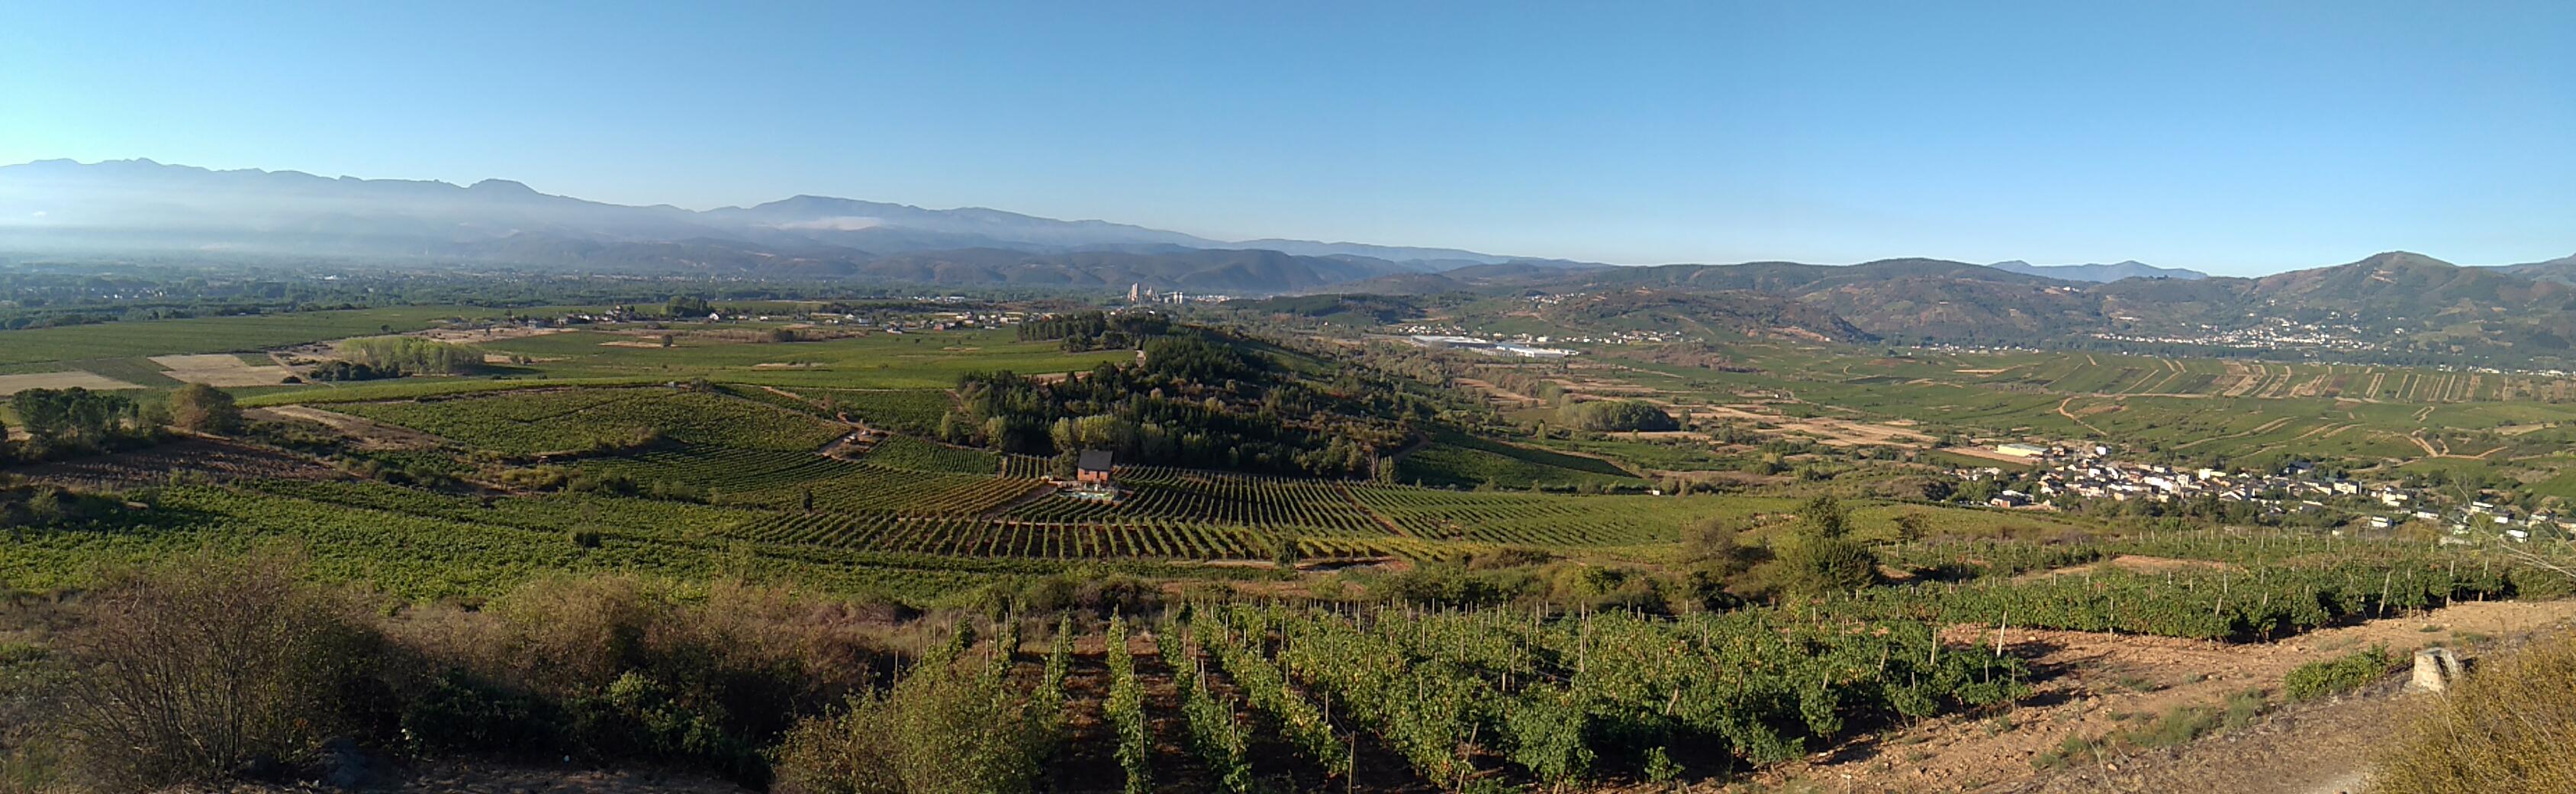 tierra prometida vino